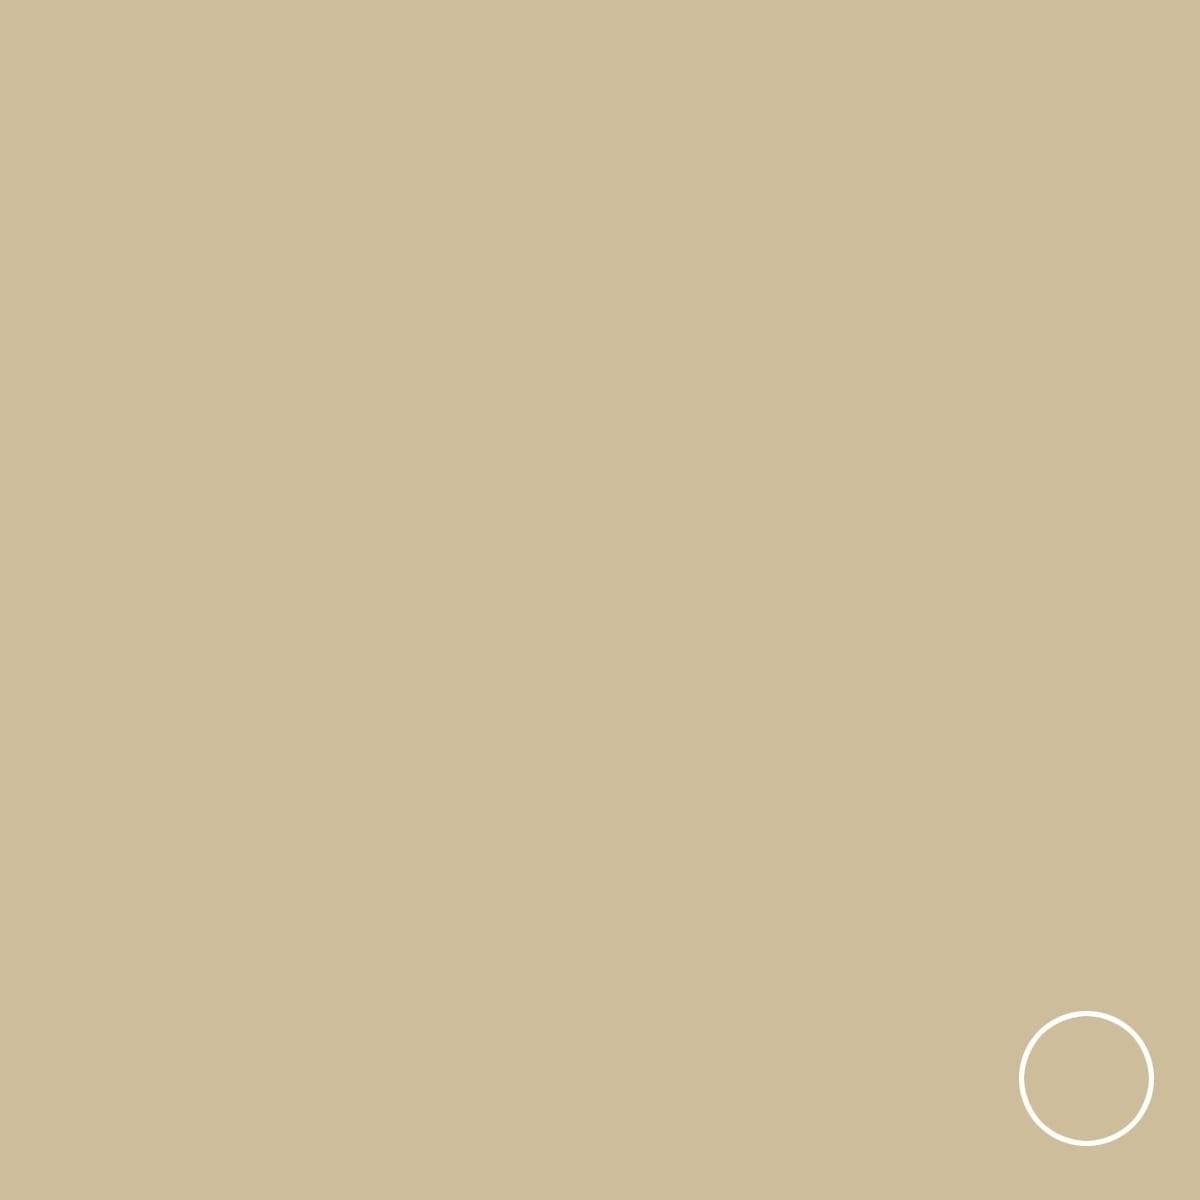 ORGANIC LINE (10ml) - PIGMENT CAMOUFLAGE 40 ORGANICLINE AMIEA (10 ml)